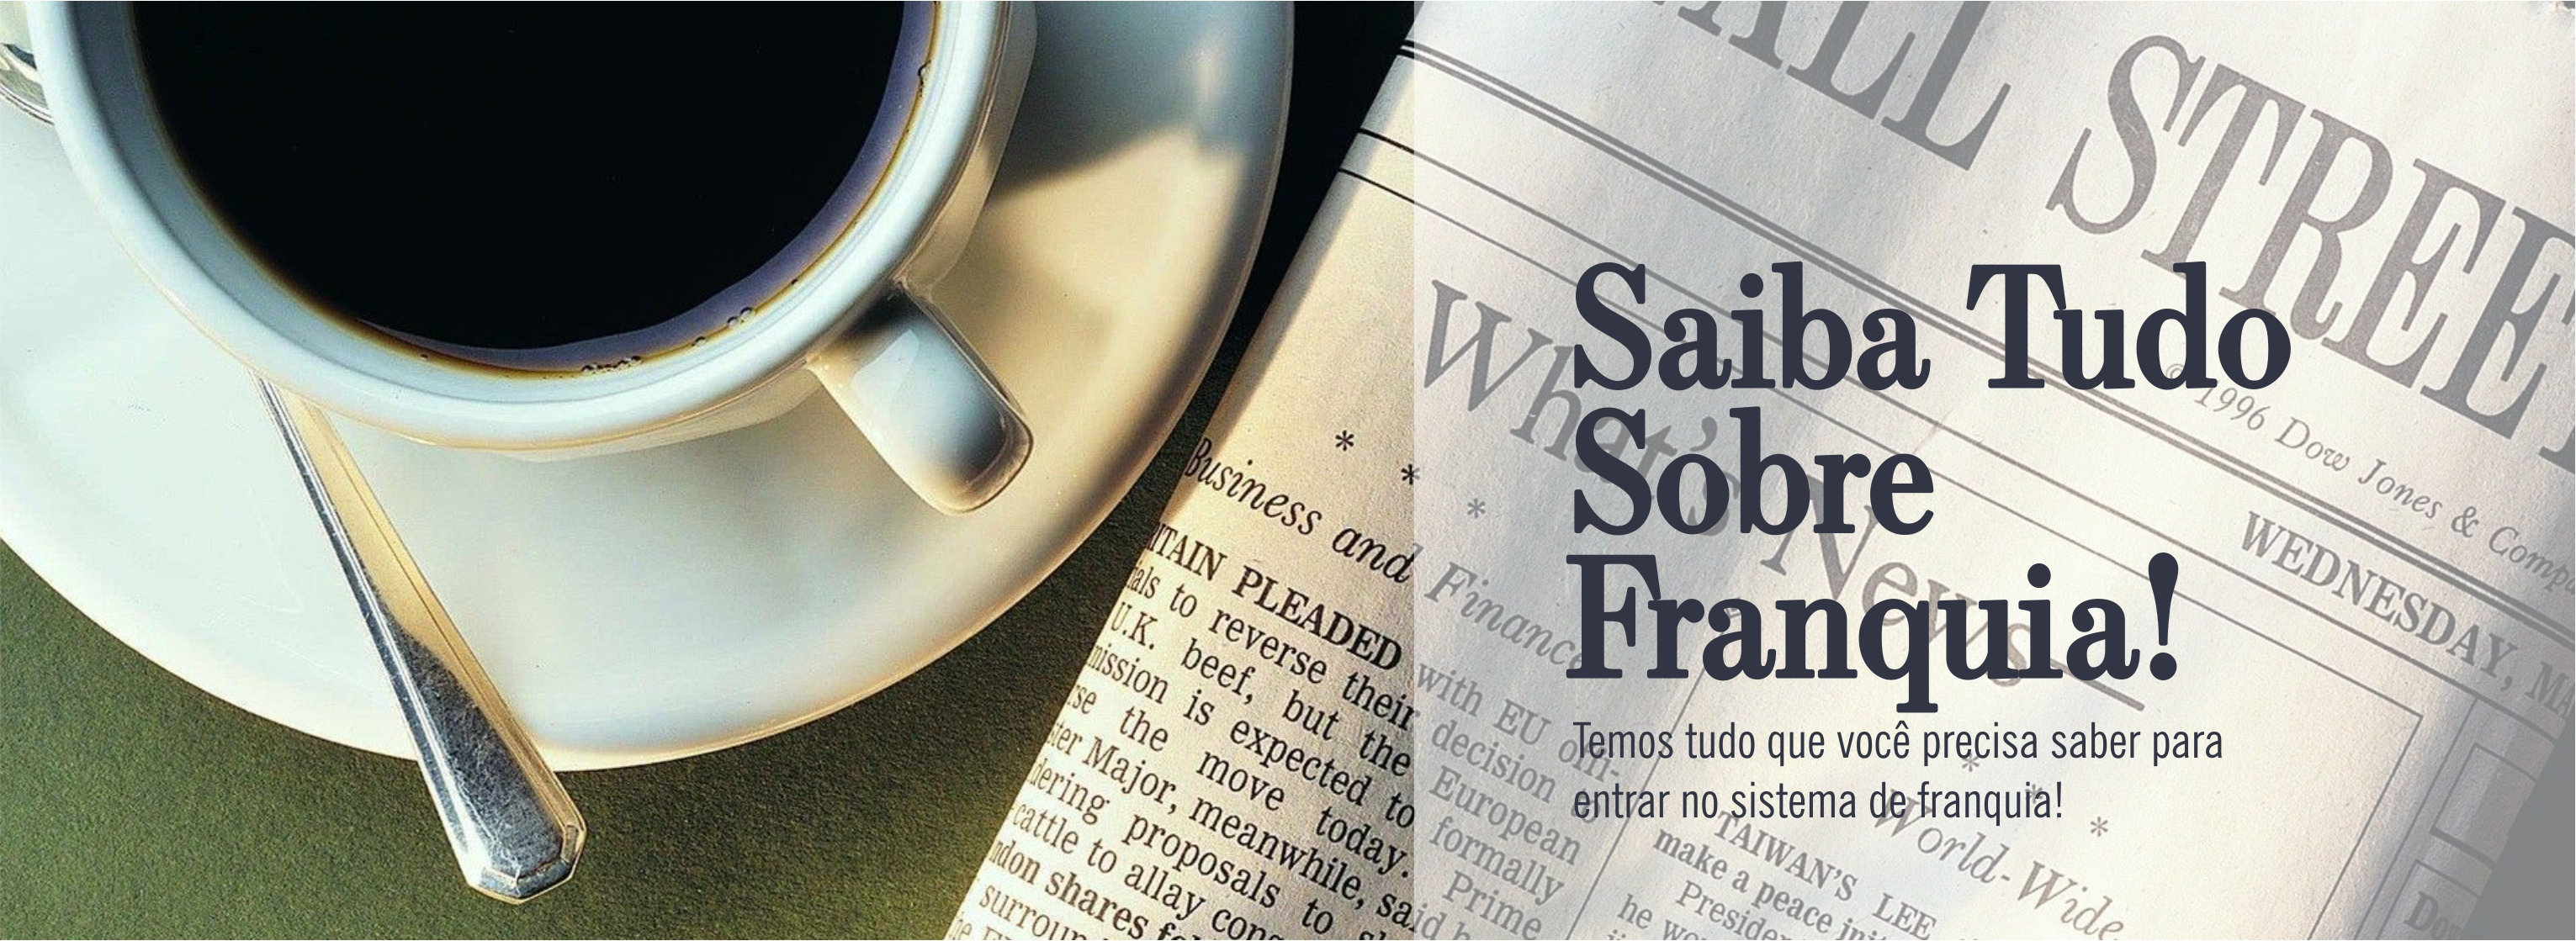 Franchinsing - Franquias Automotivas